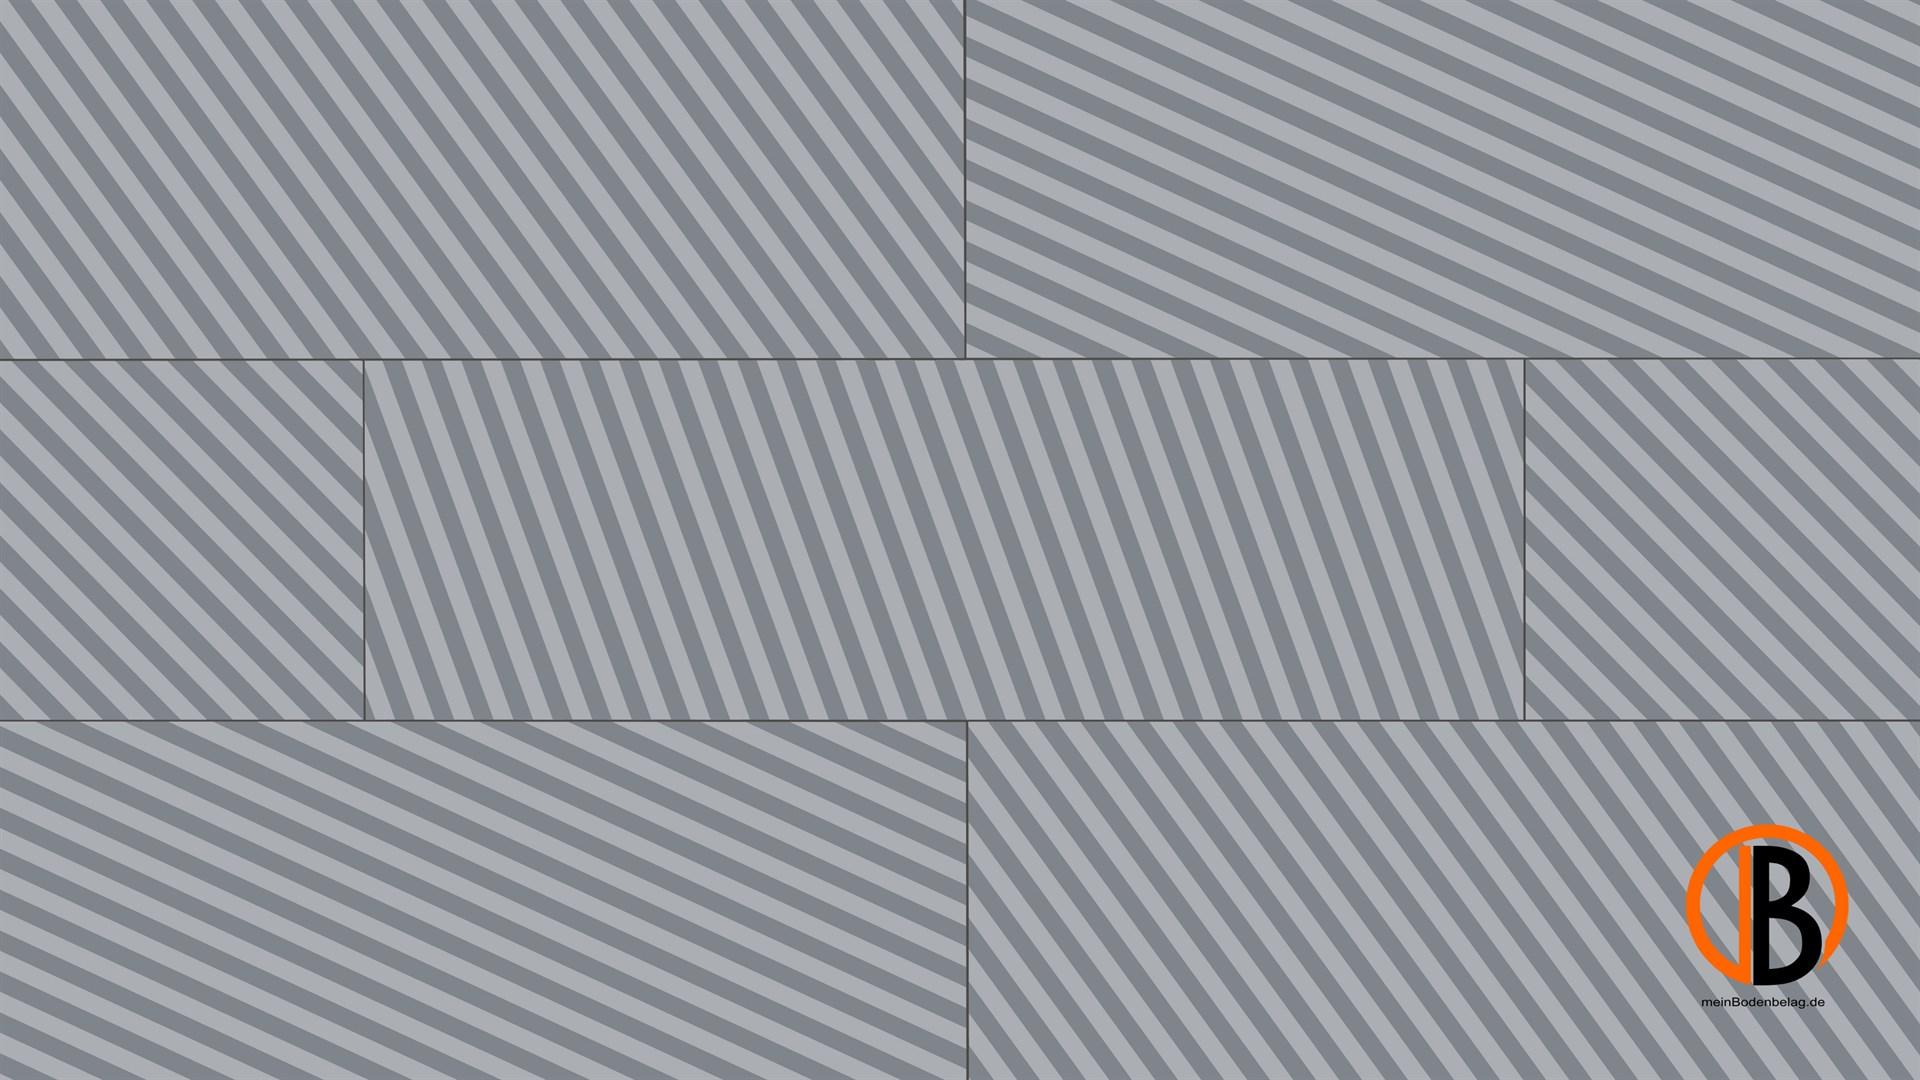 parador laminat edition 1 piero lissoni optical minifase. Black Bedroom Furniture Sets. Home Design Ideas